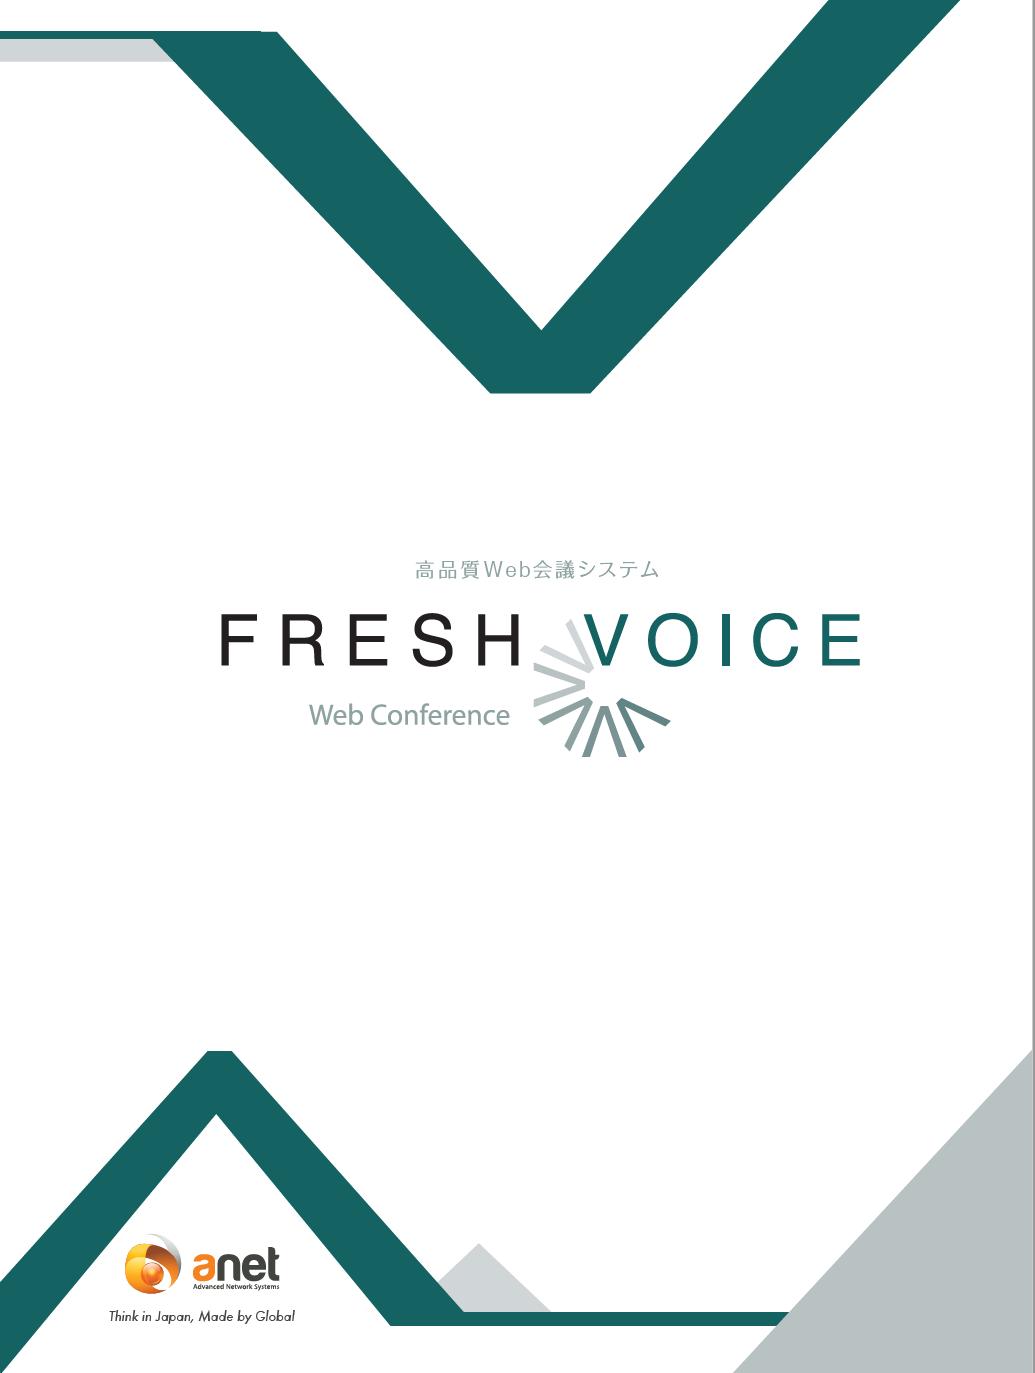 TV会議システムFRESH VOICE